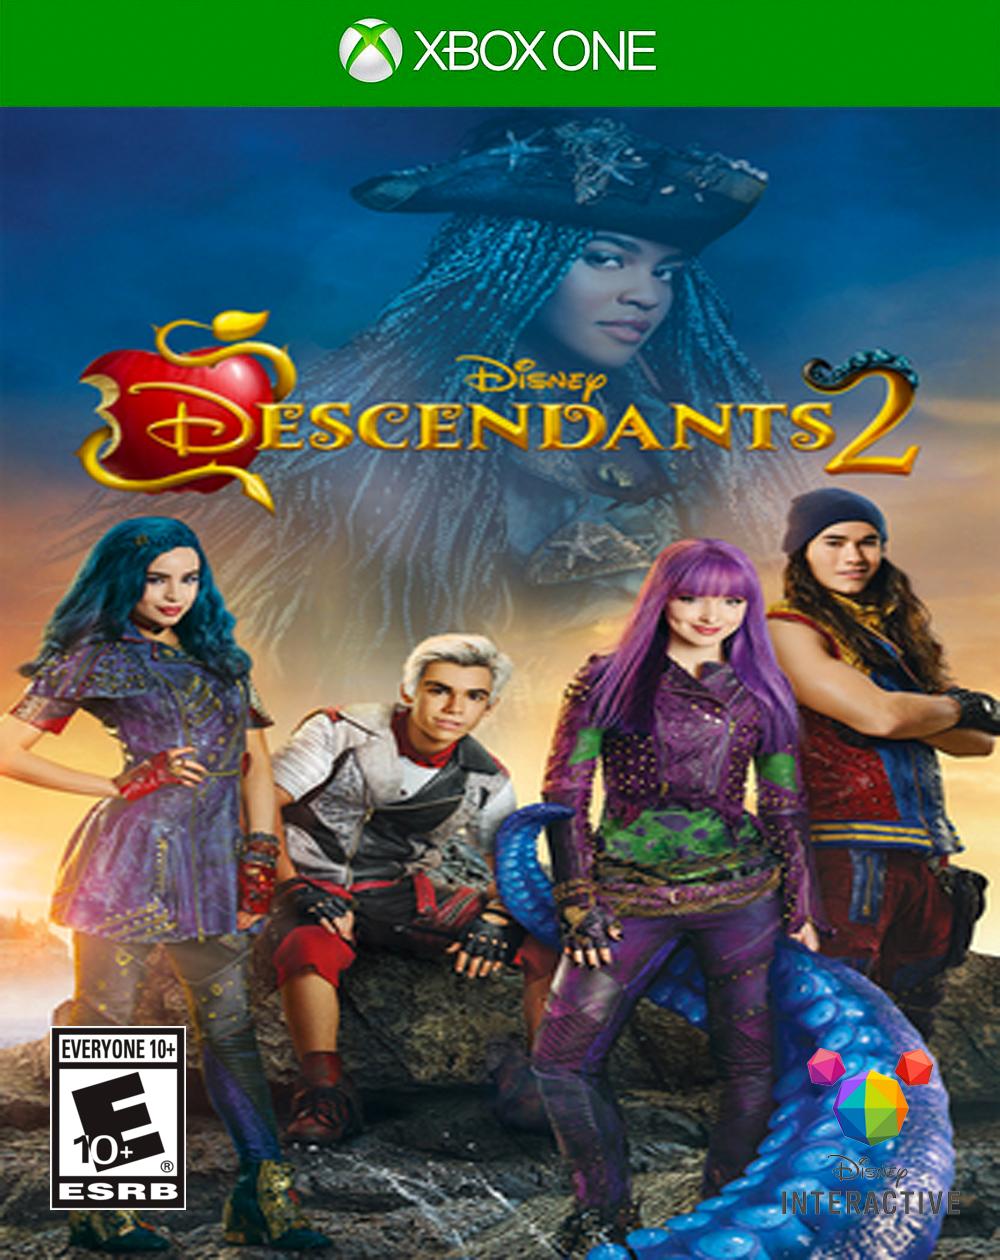 Disney's Descendants 2: The Video Game